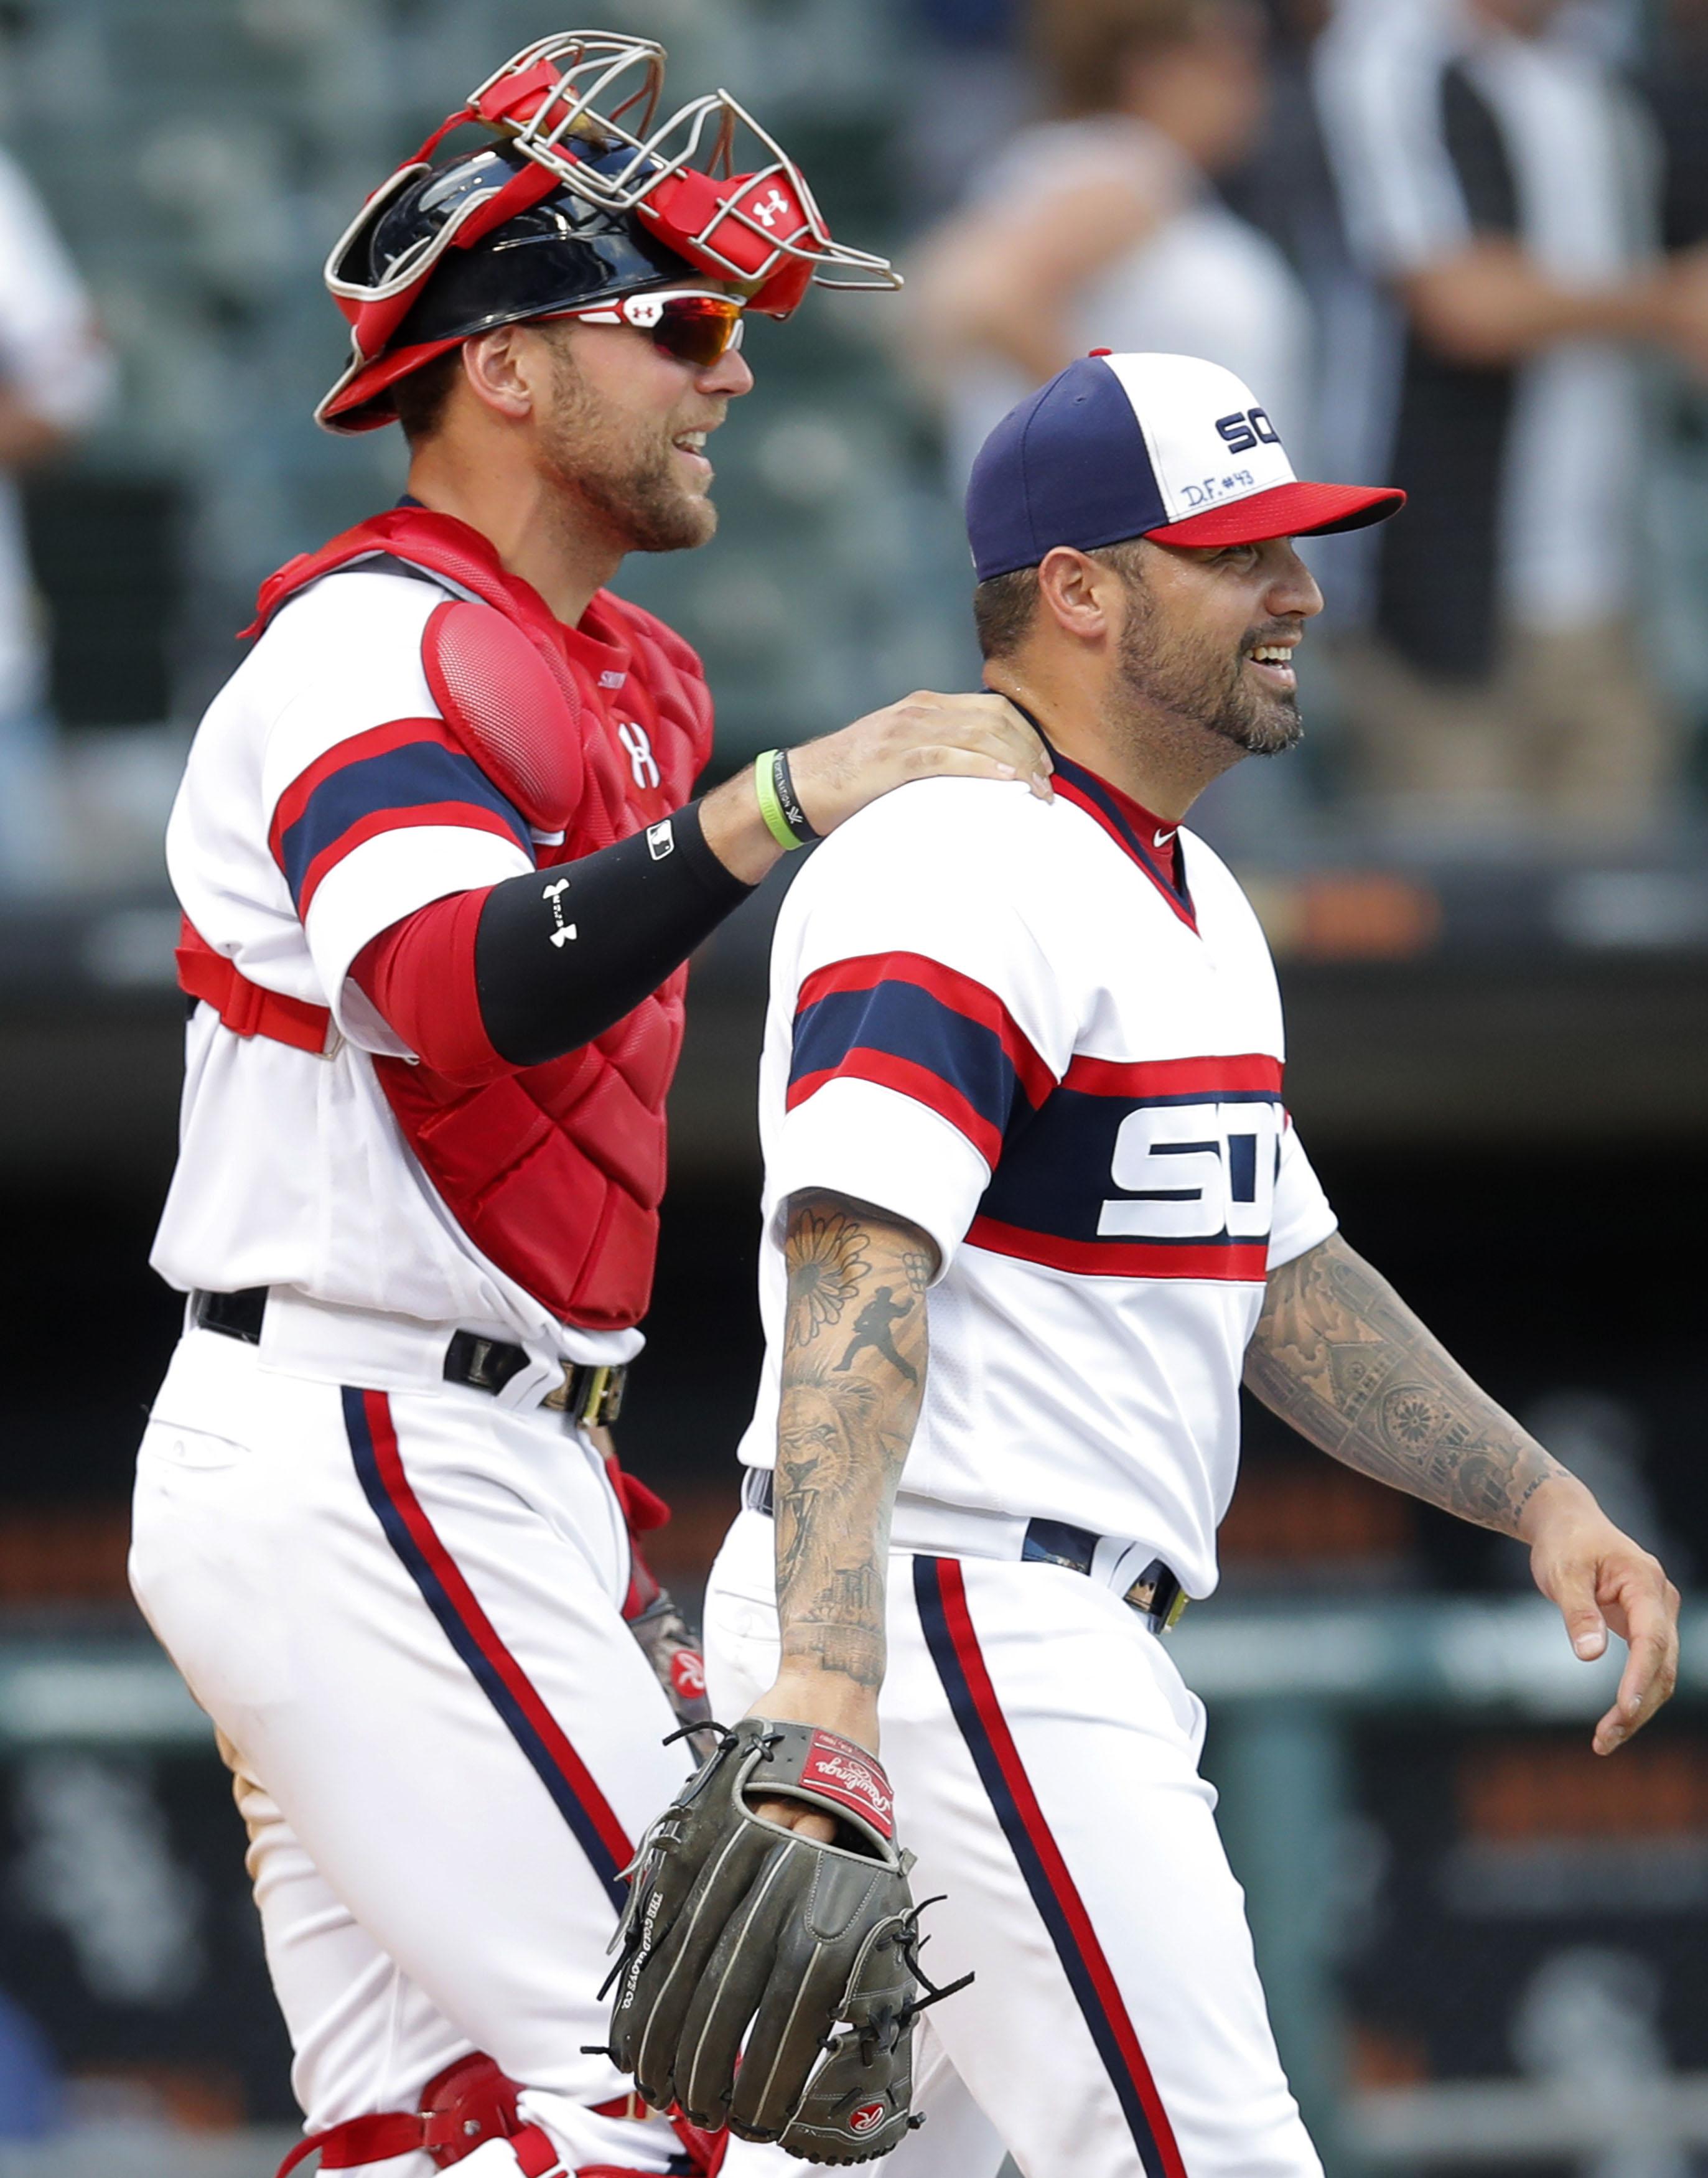 MLB: Boston Red Sox at Chicago White Sox